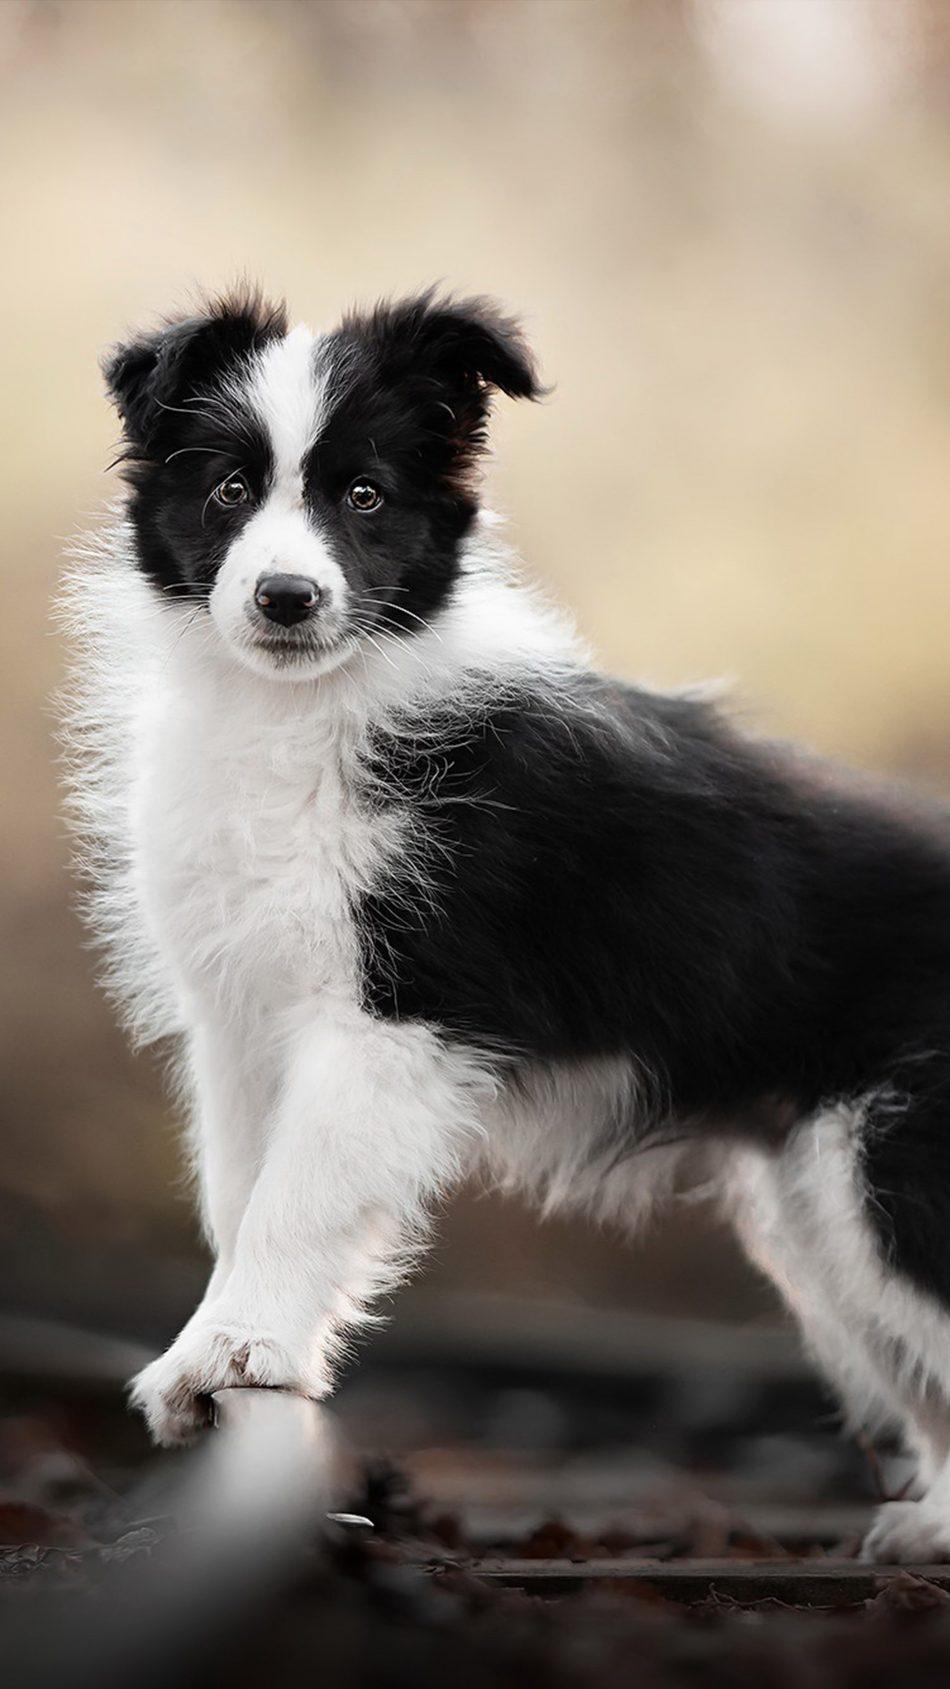 Border Collie Pet Dog 4K Ultra HD Mobile Wallpaper